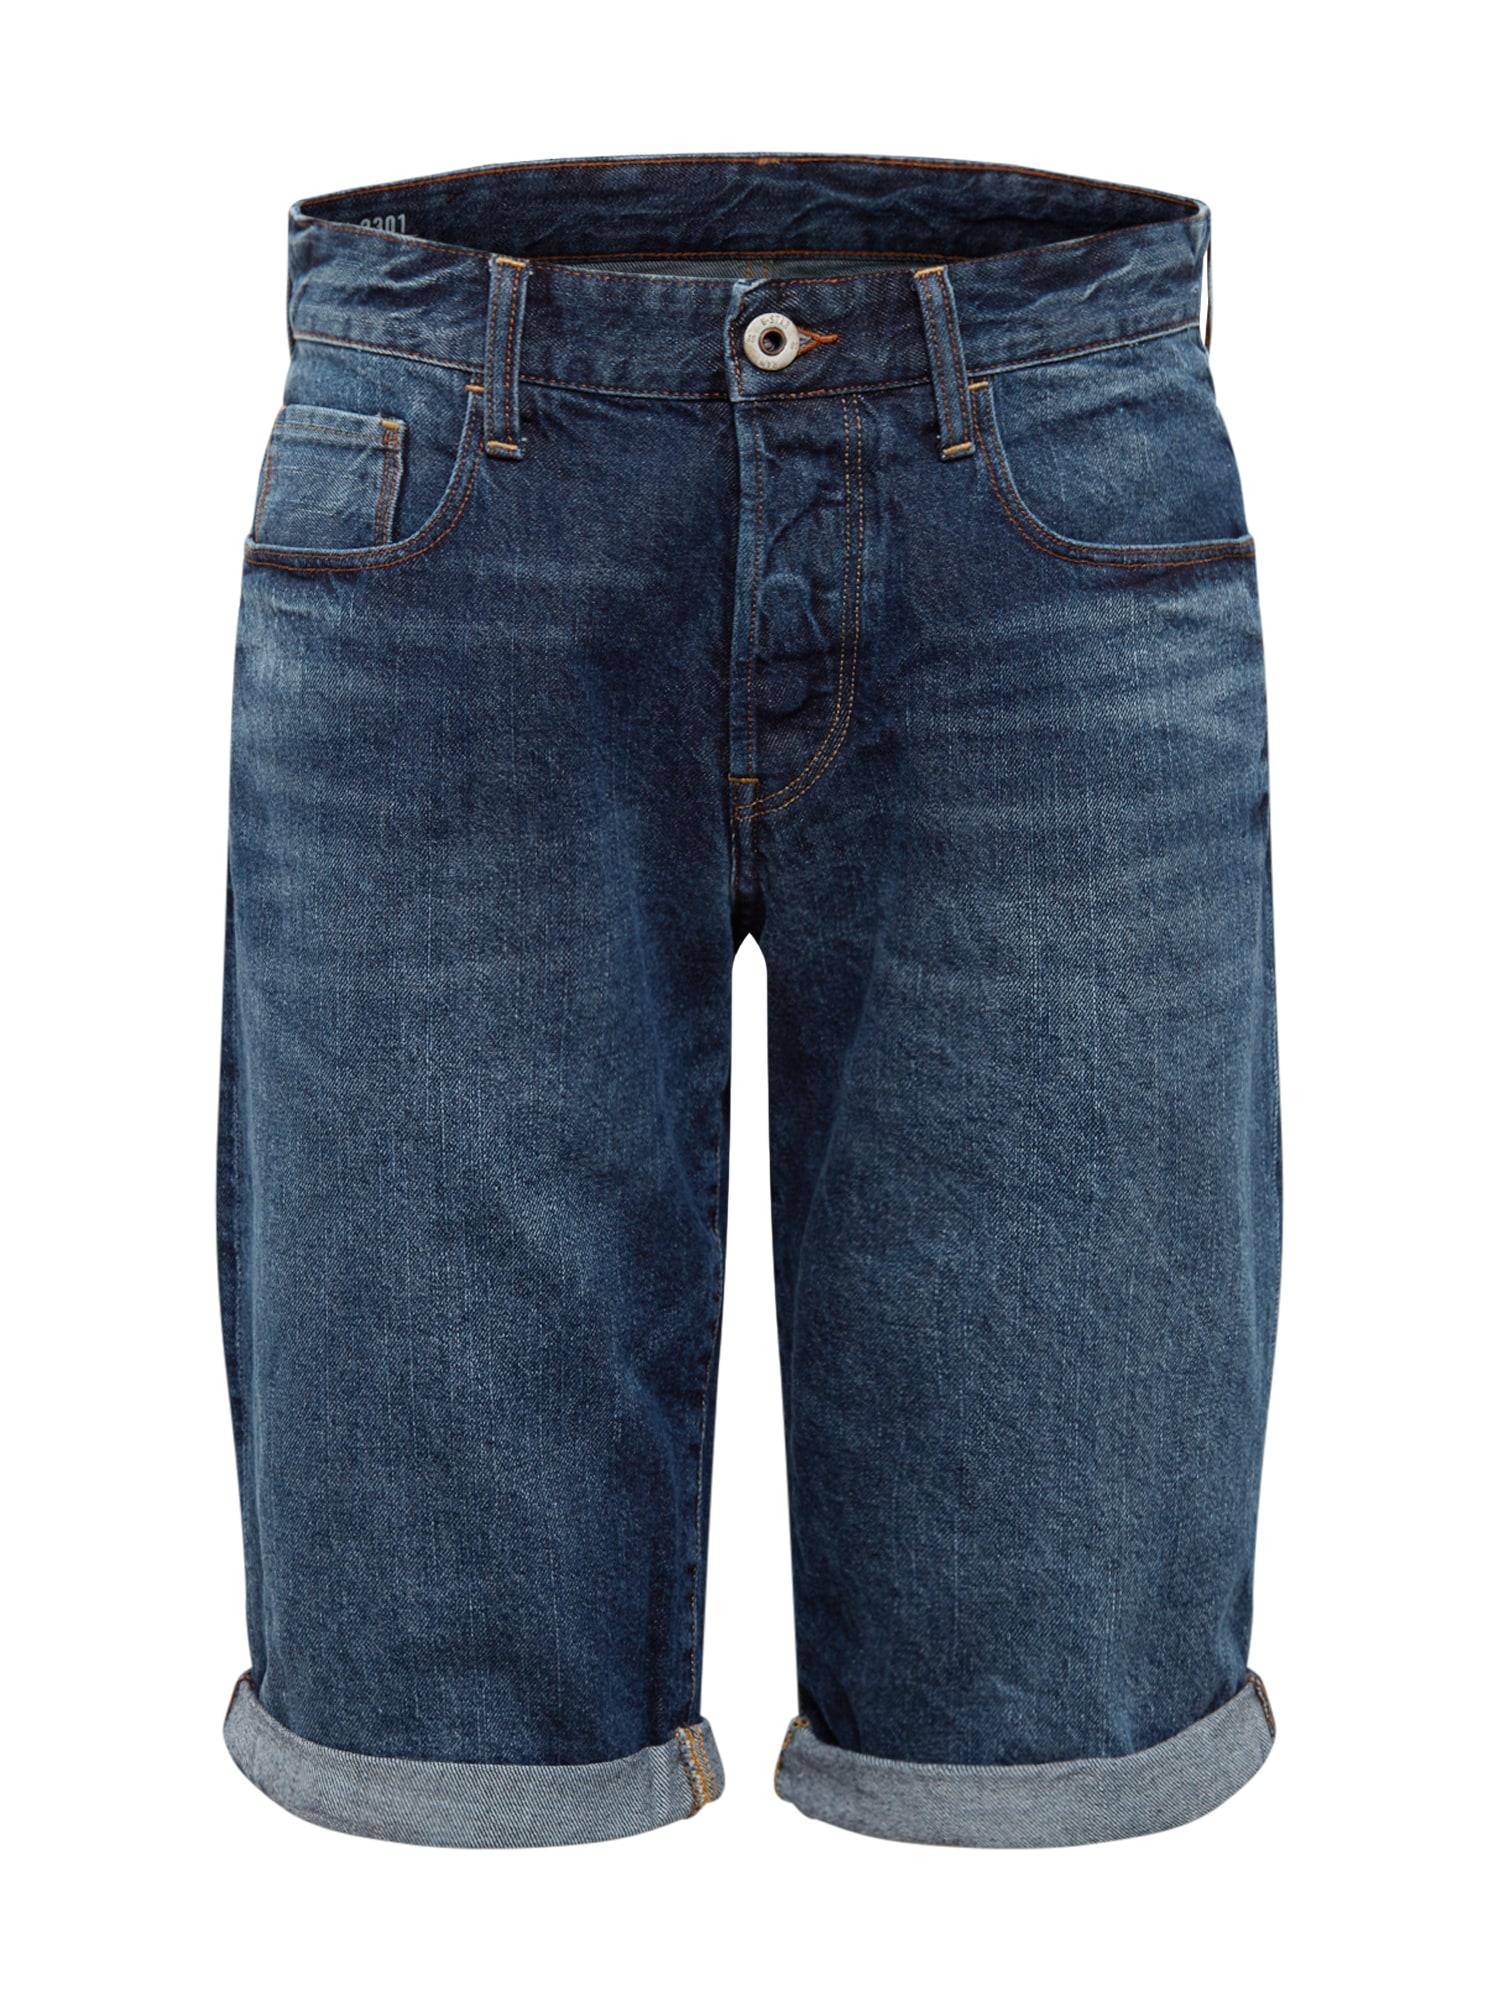 G-Star RAW Džinsai '3301 1/2' tamsiai (džinso) mėlyna